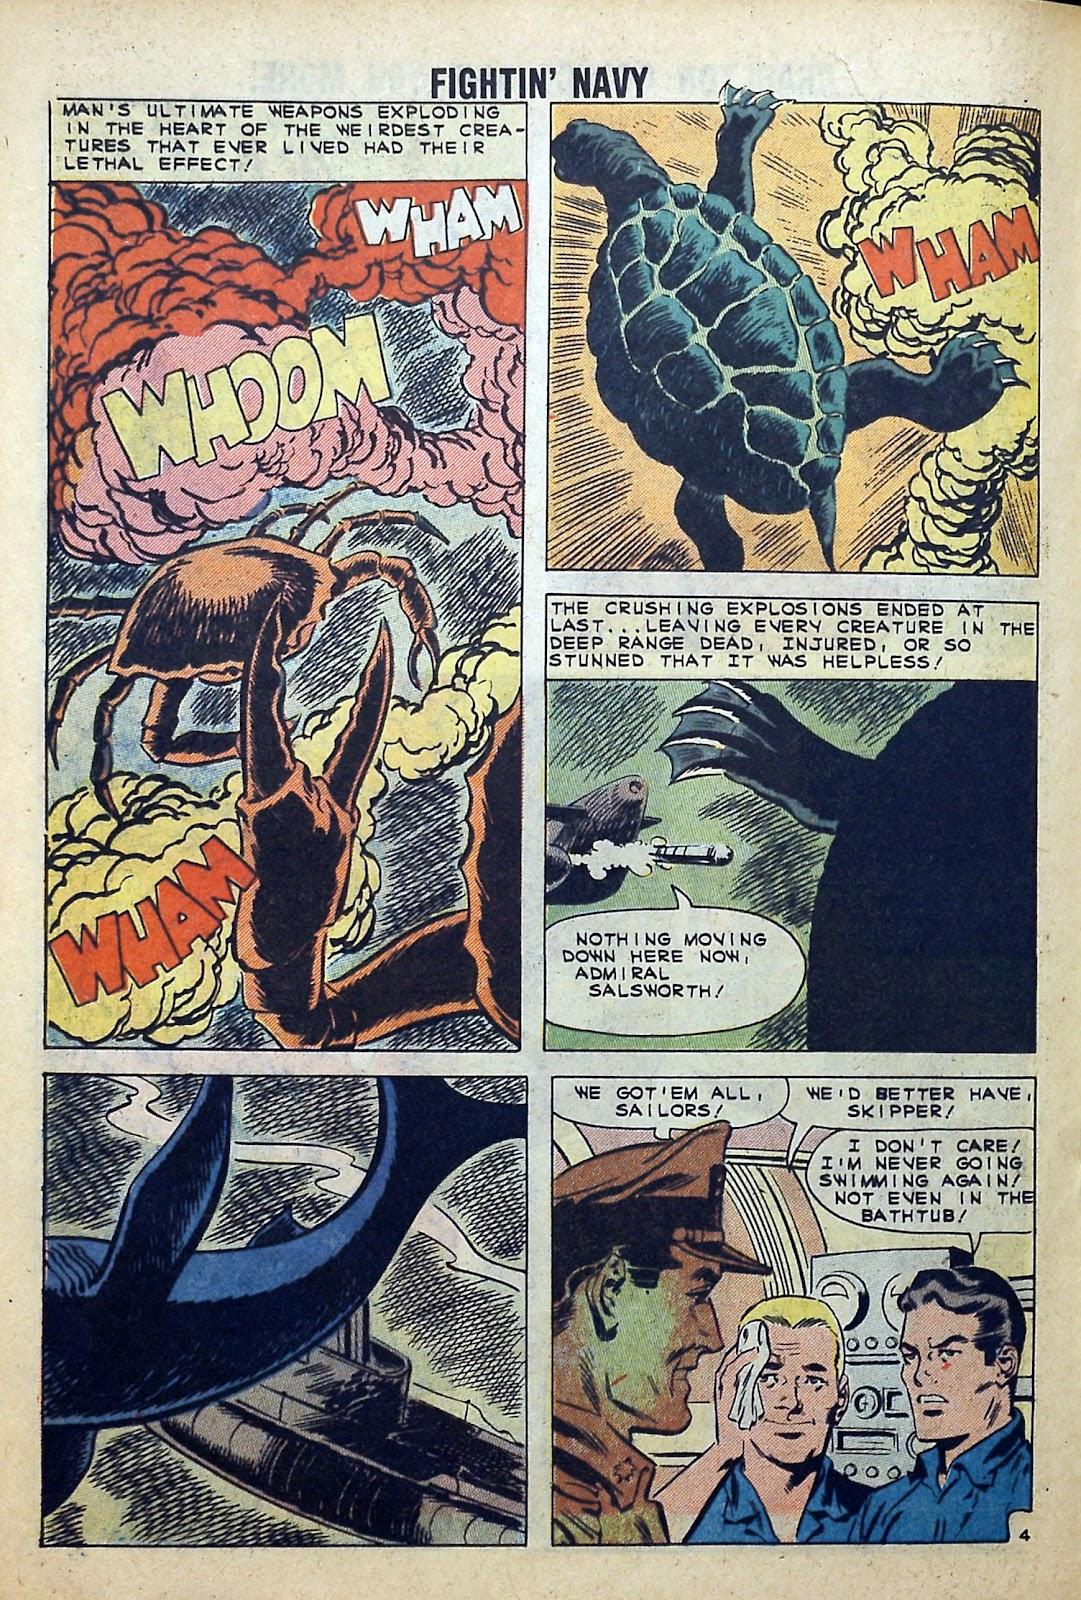 Read online Fightin' Navy comic -  Issue #99 - 20